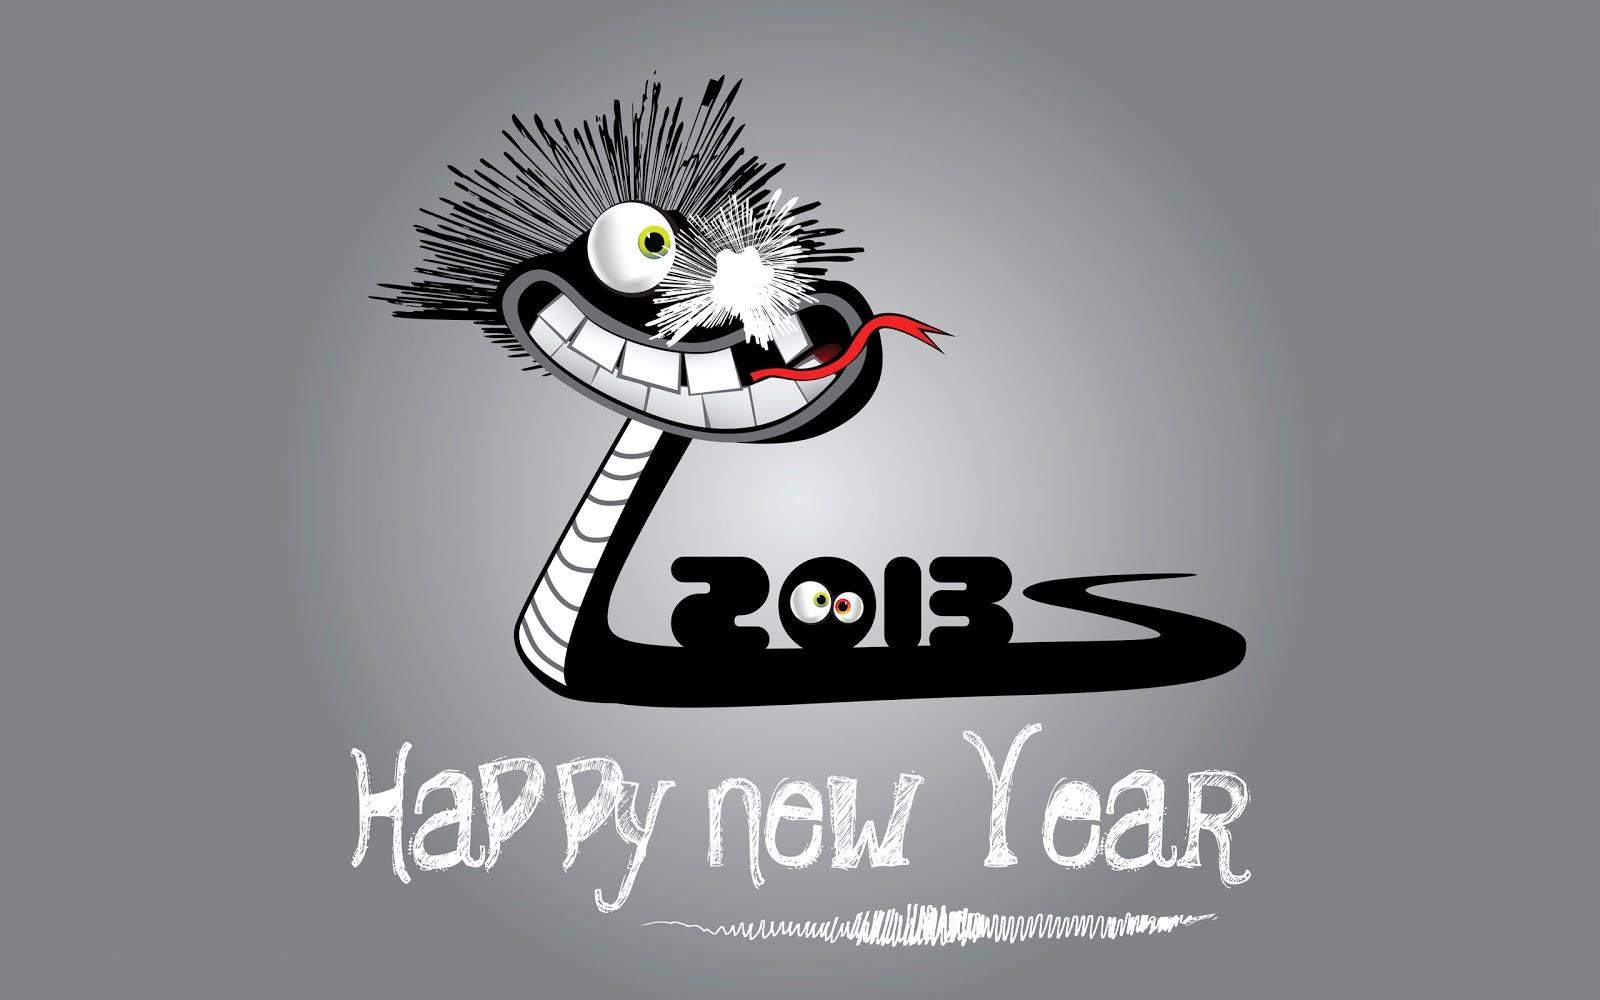 2013-Funny-Happy-New-Year